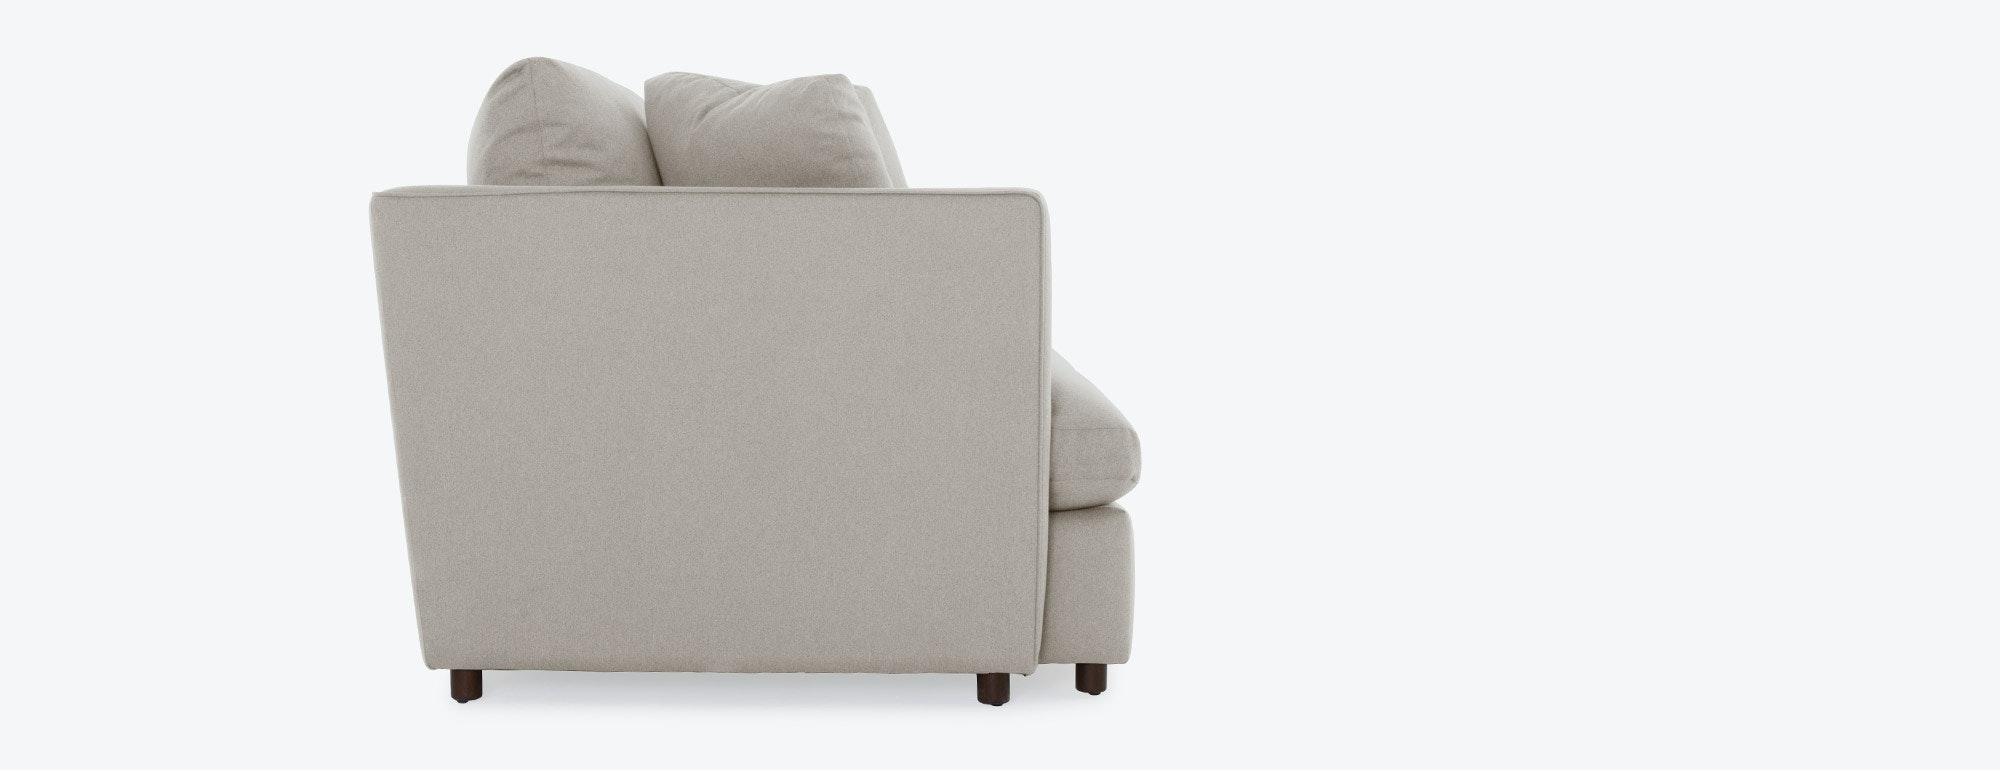 Chair and a half - Shown In Dawson Sand Fabric